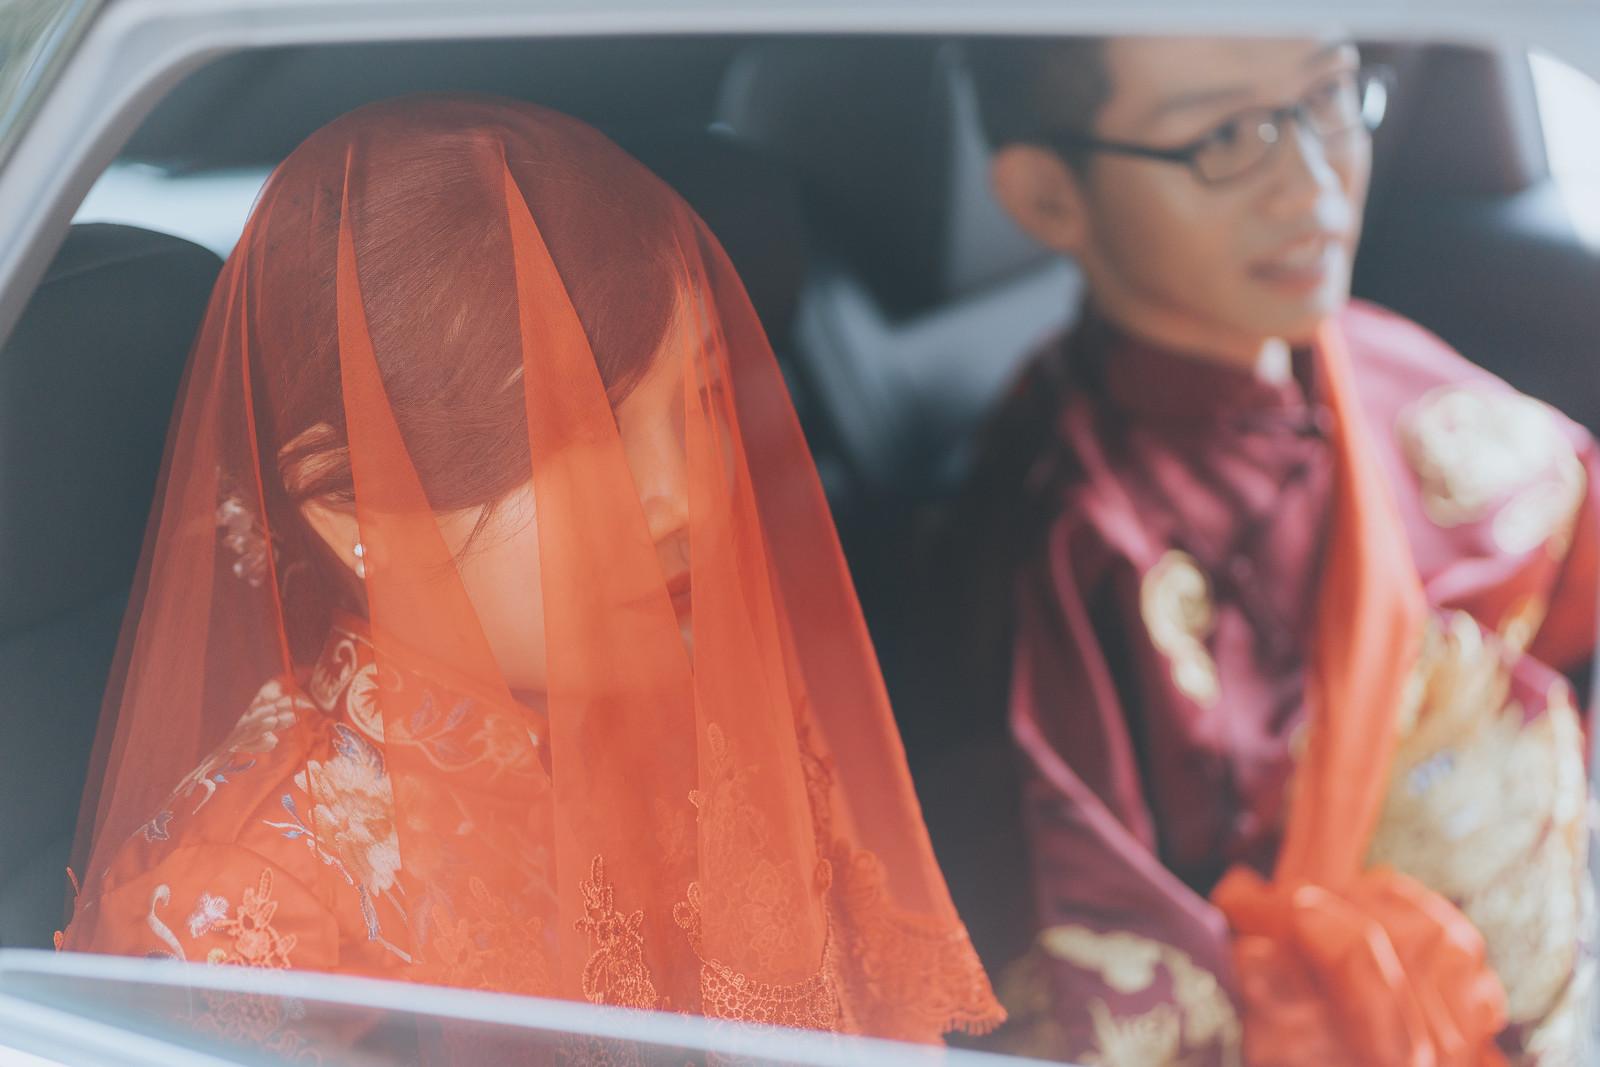 51531037404_bb38f07ee1_h- 婚攝, 婚禮攝影, 婚紗包套, 婚禮紀錄, 親子寫真, 美式婚紗攝影, 自助婚紗, 小資婚紗, 婚攝推薦, 家庭寫真, 孕婦寫真, 顏氏牧場婚攝, 林酒店婚攝, 萊特薇庭婚攝, 婚攝推薦, 婚紗婚攝, 婚紗攝影, 婚禮攝影推薦, 自助婚紗